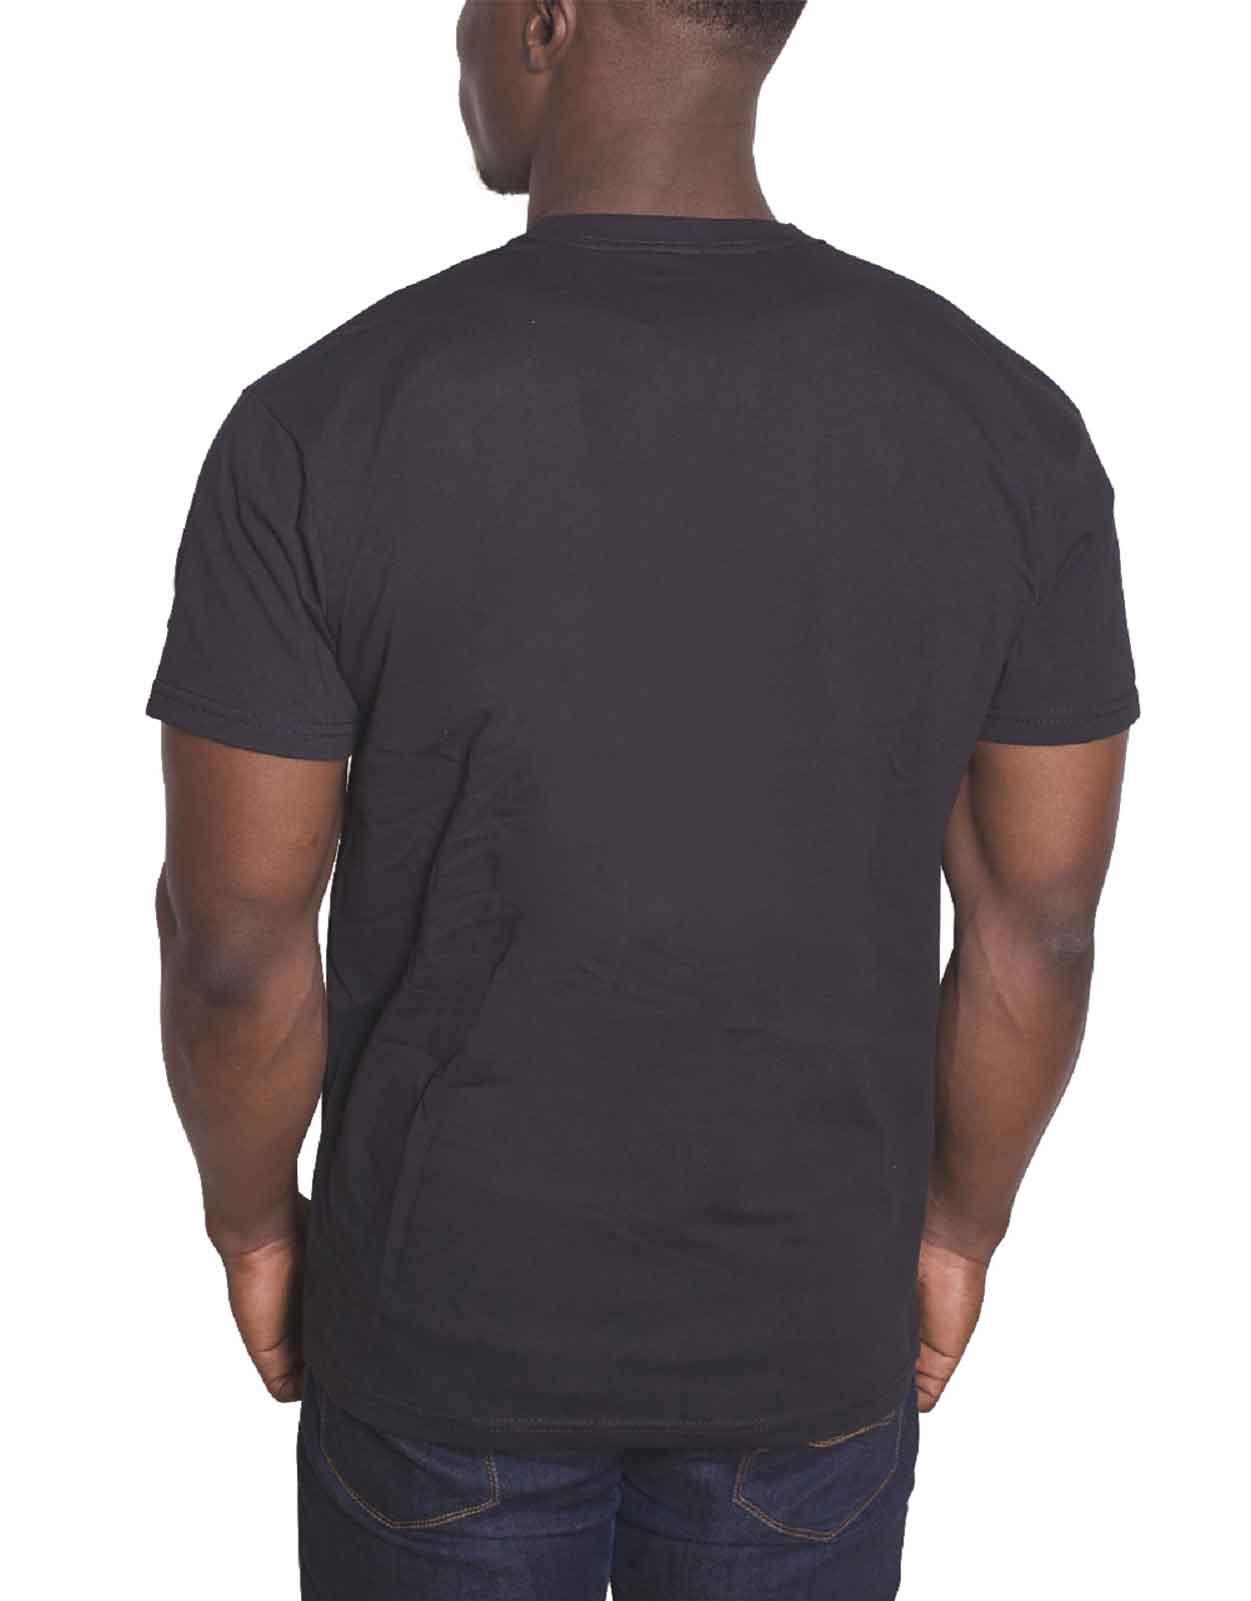 Motorhead-T-Shirt-Lemmy-RIP-England-warpig-clean-your-clock-official-new-mens Indexbild 23